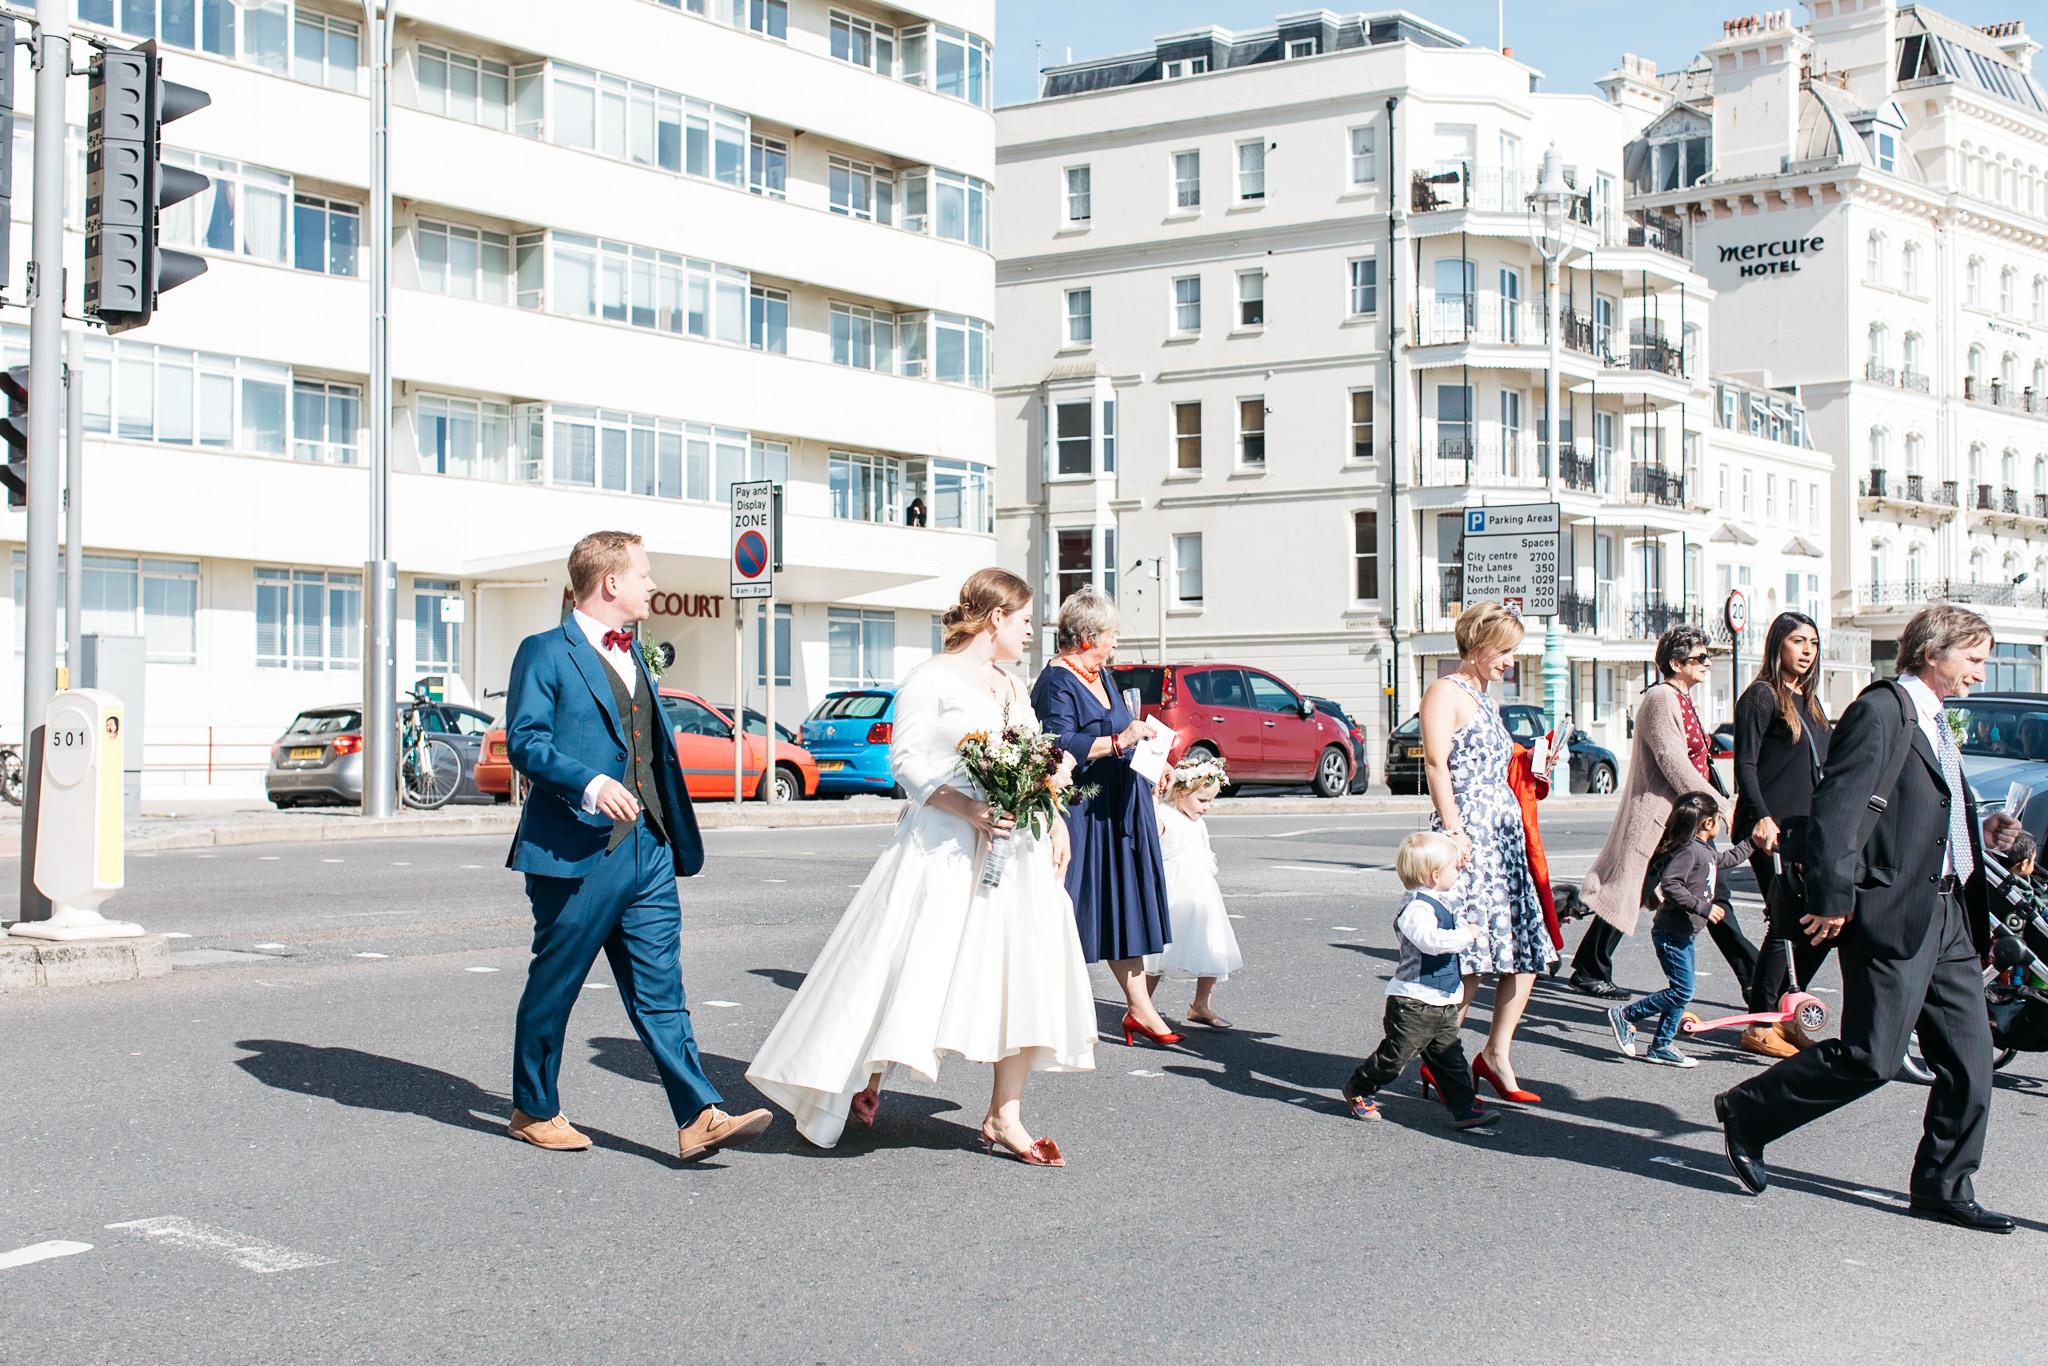 st_andrews_fabrica_brighton_wedding_572.jpg